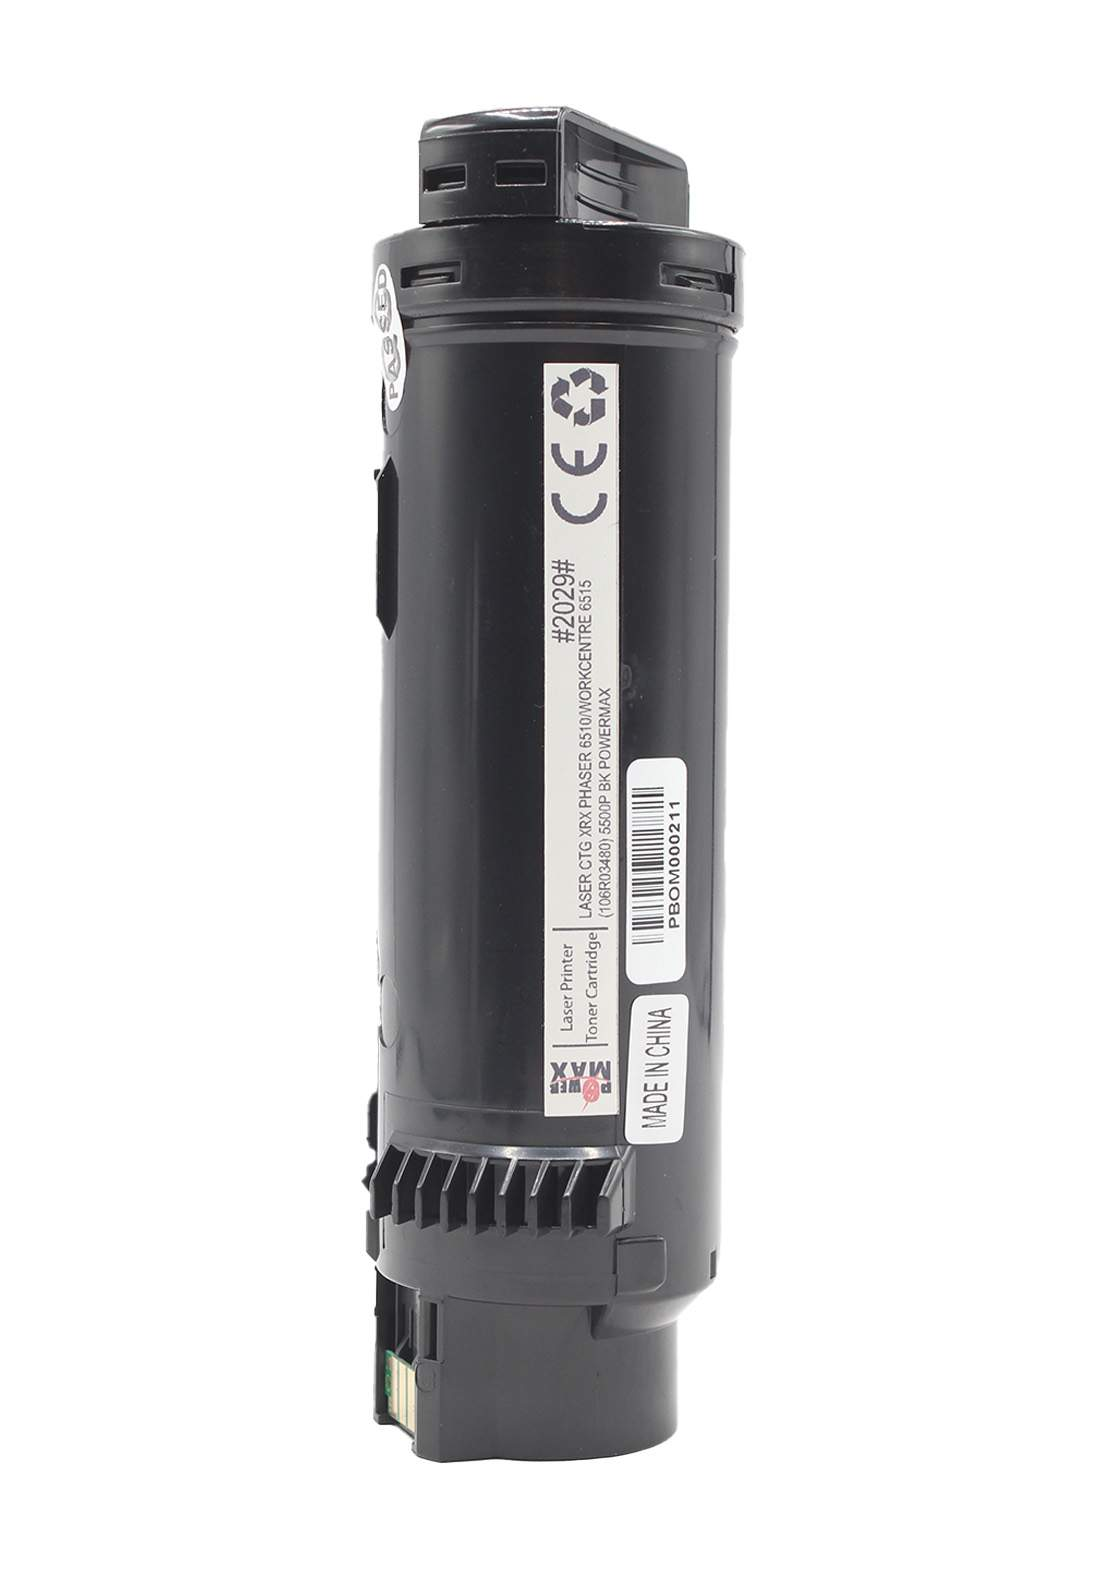 Power Max CTG Xerox Phaser 6510/ Workcentre 6515 (106R03480) 5500P Laser Printer Toner Cartridge خرطوشة حبر